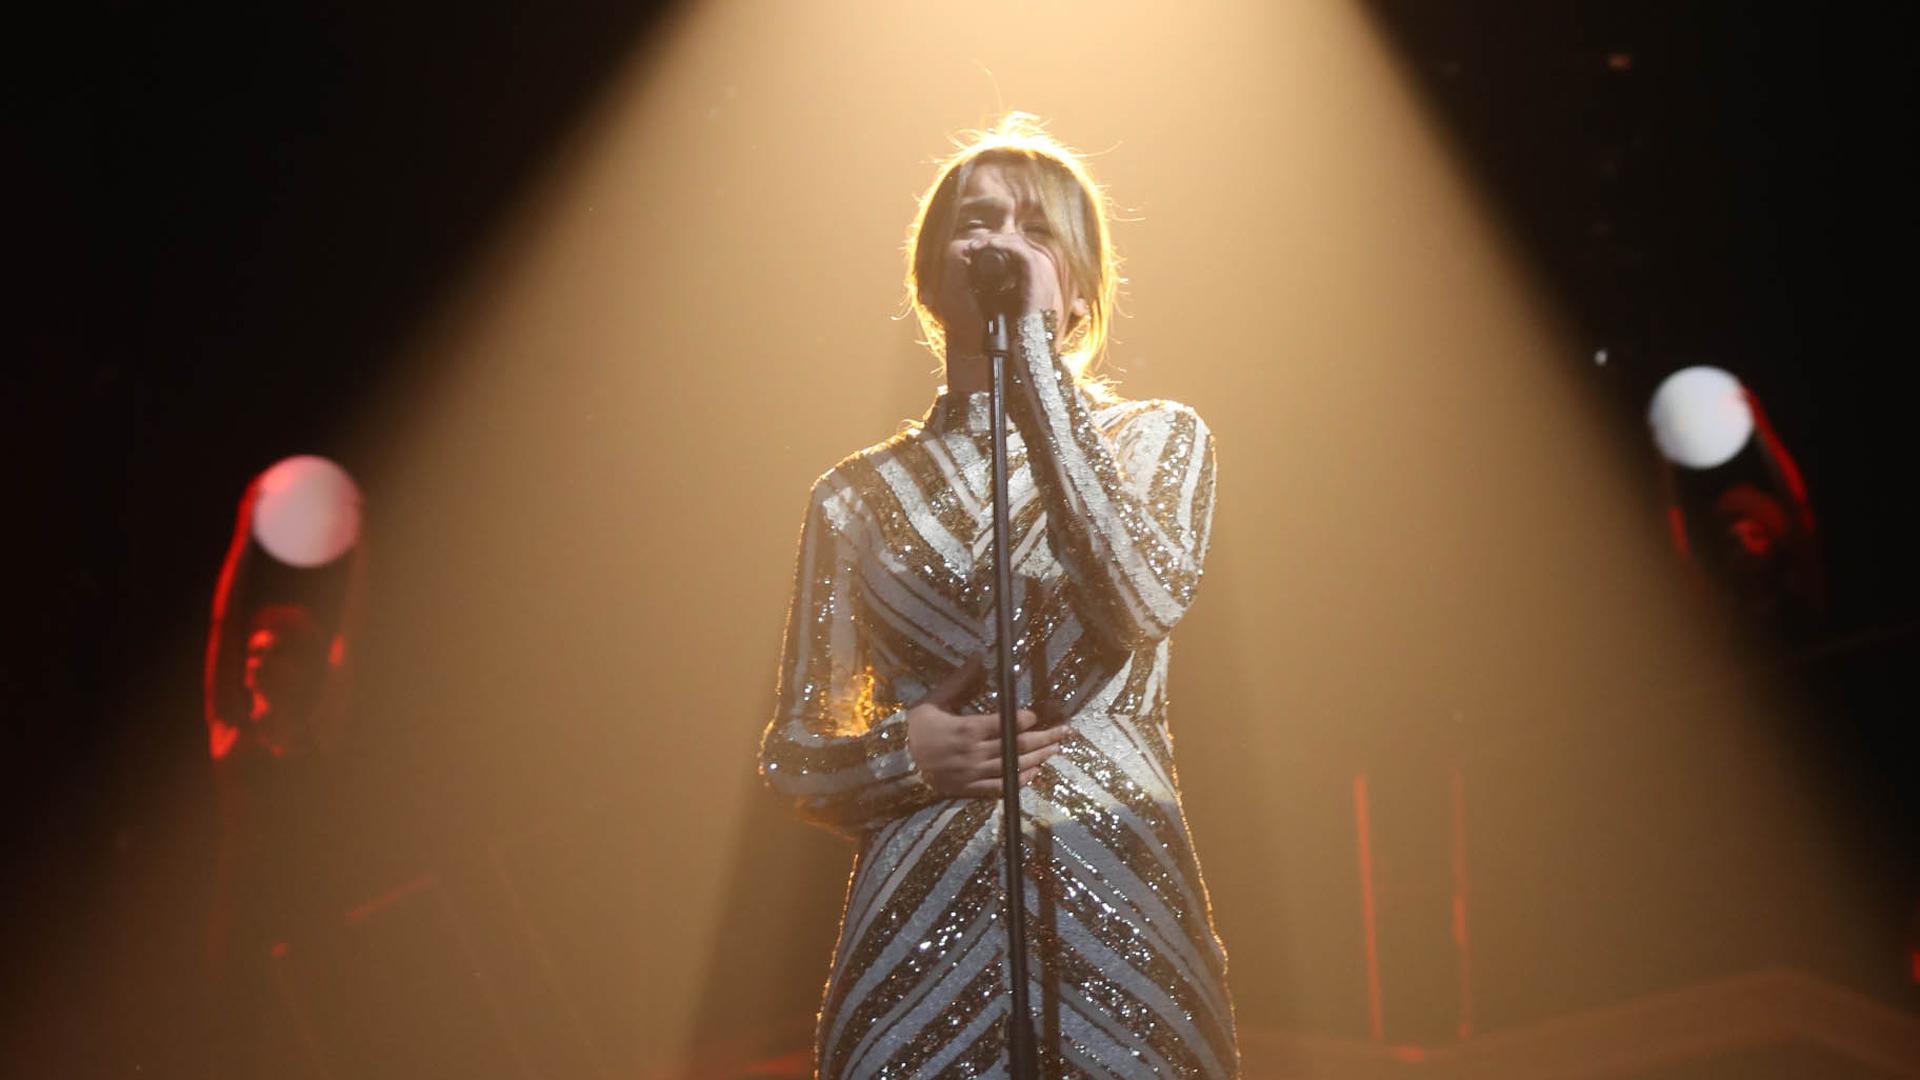 Operación Triunfo 2017 - Amaia canta 'Shake it out' en la Gala 9 de OT